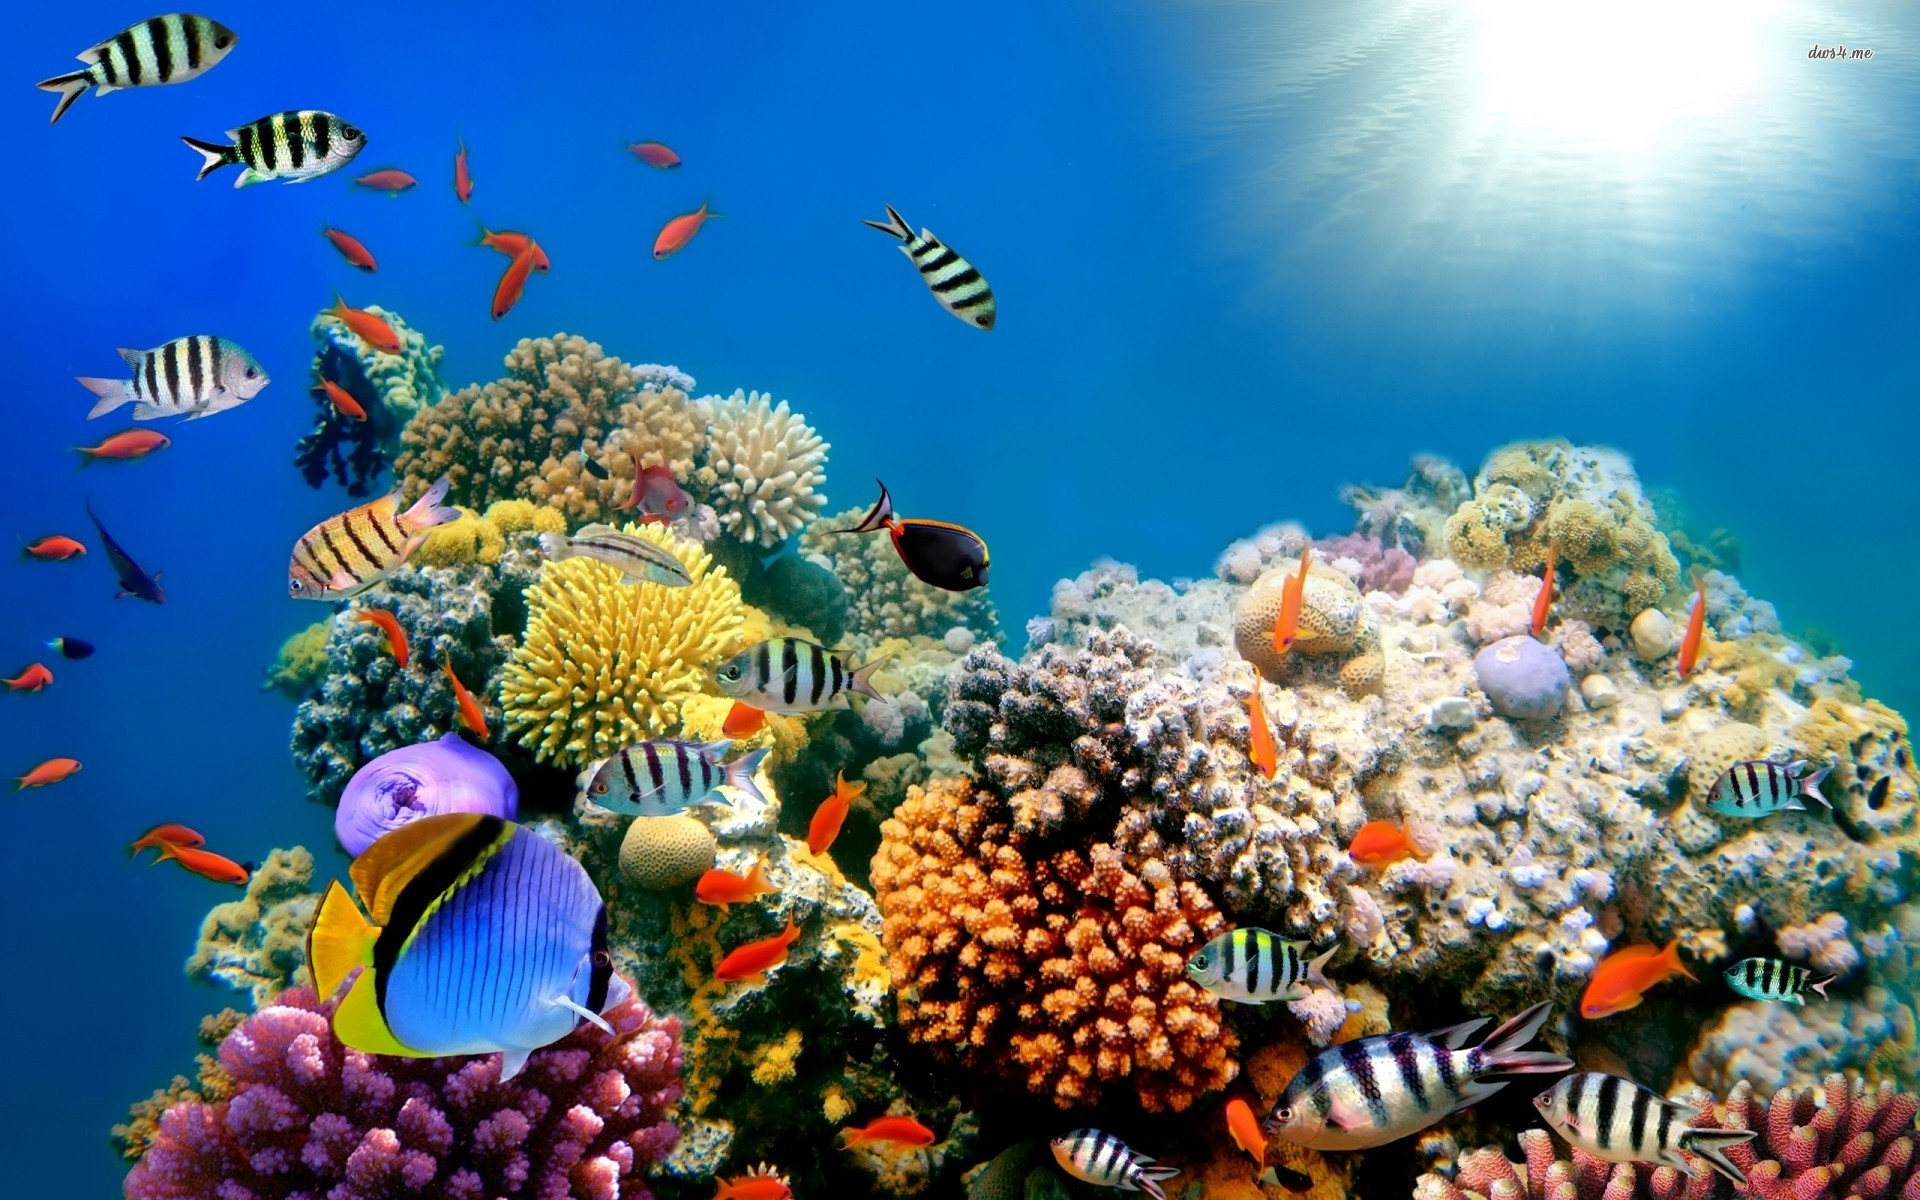 wallpaper beautiful fish background gallery 1920x1200 1920x1200